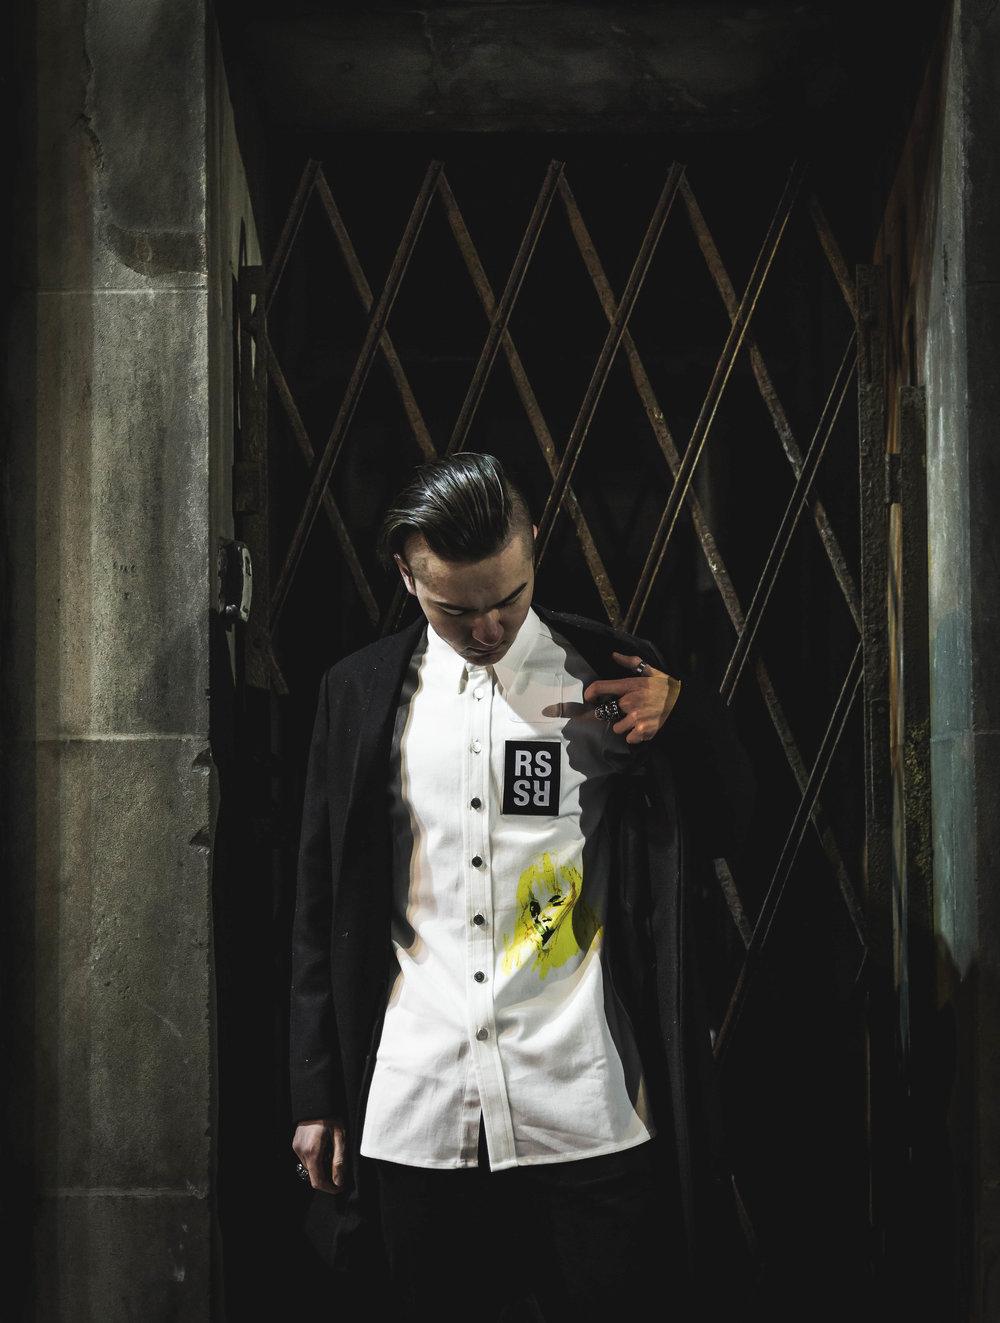 Wearing:   COS Overcoat  Raf Simons Dress Shirt  Photo by Adam Zarowny.